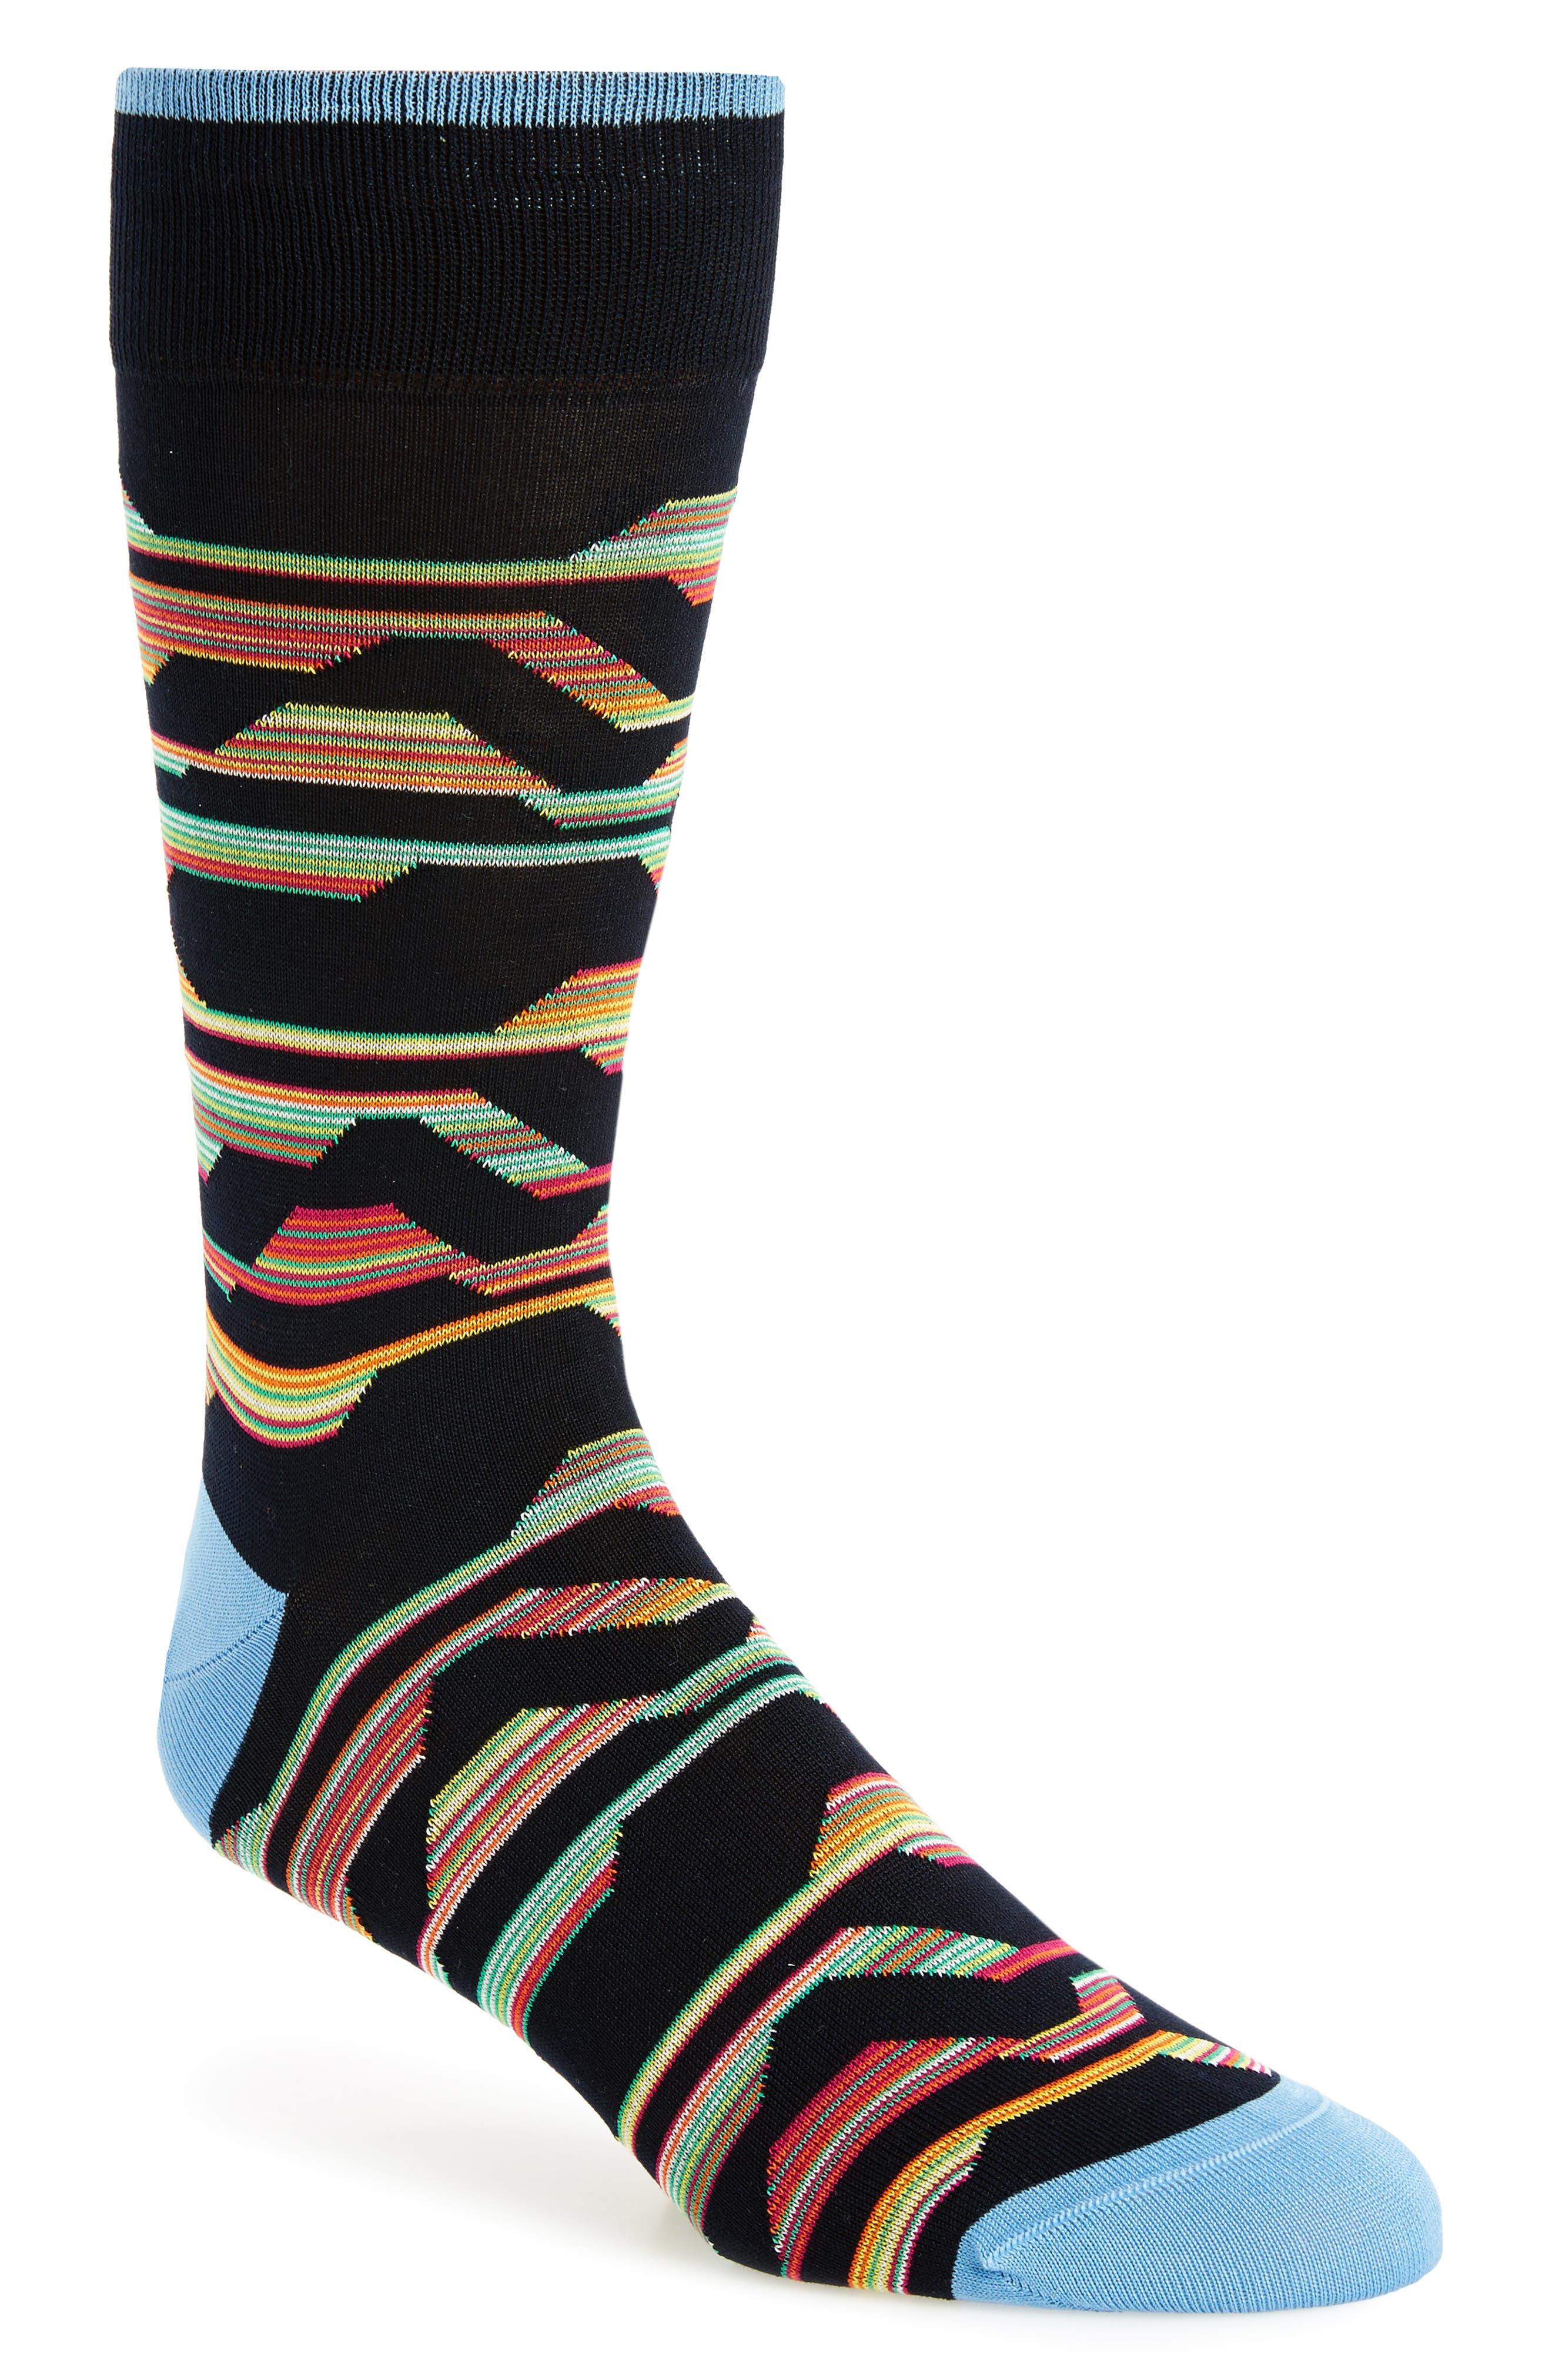 Mercerized Cotton Blend Socks,                             Main thumbnail 1, color,                             Midnight